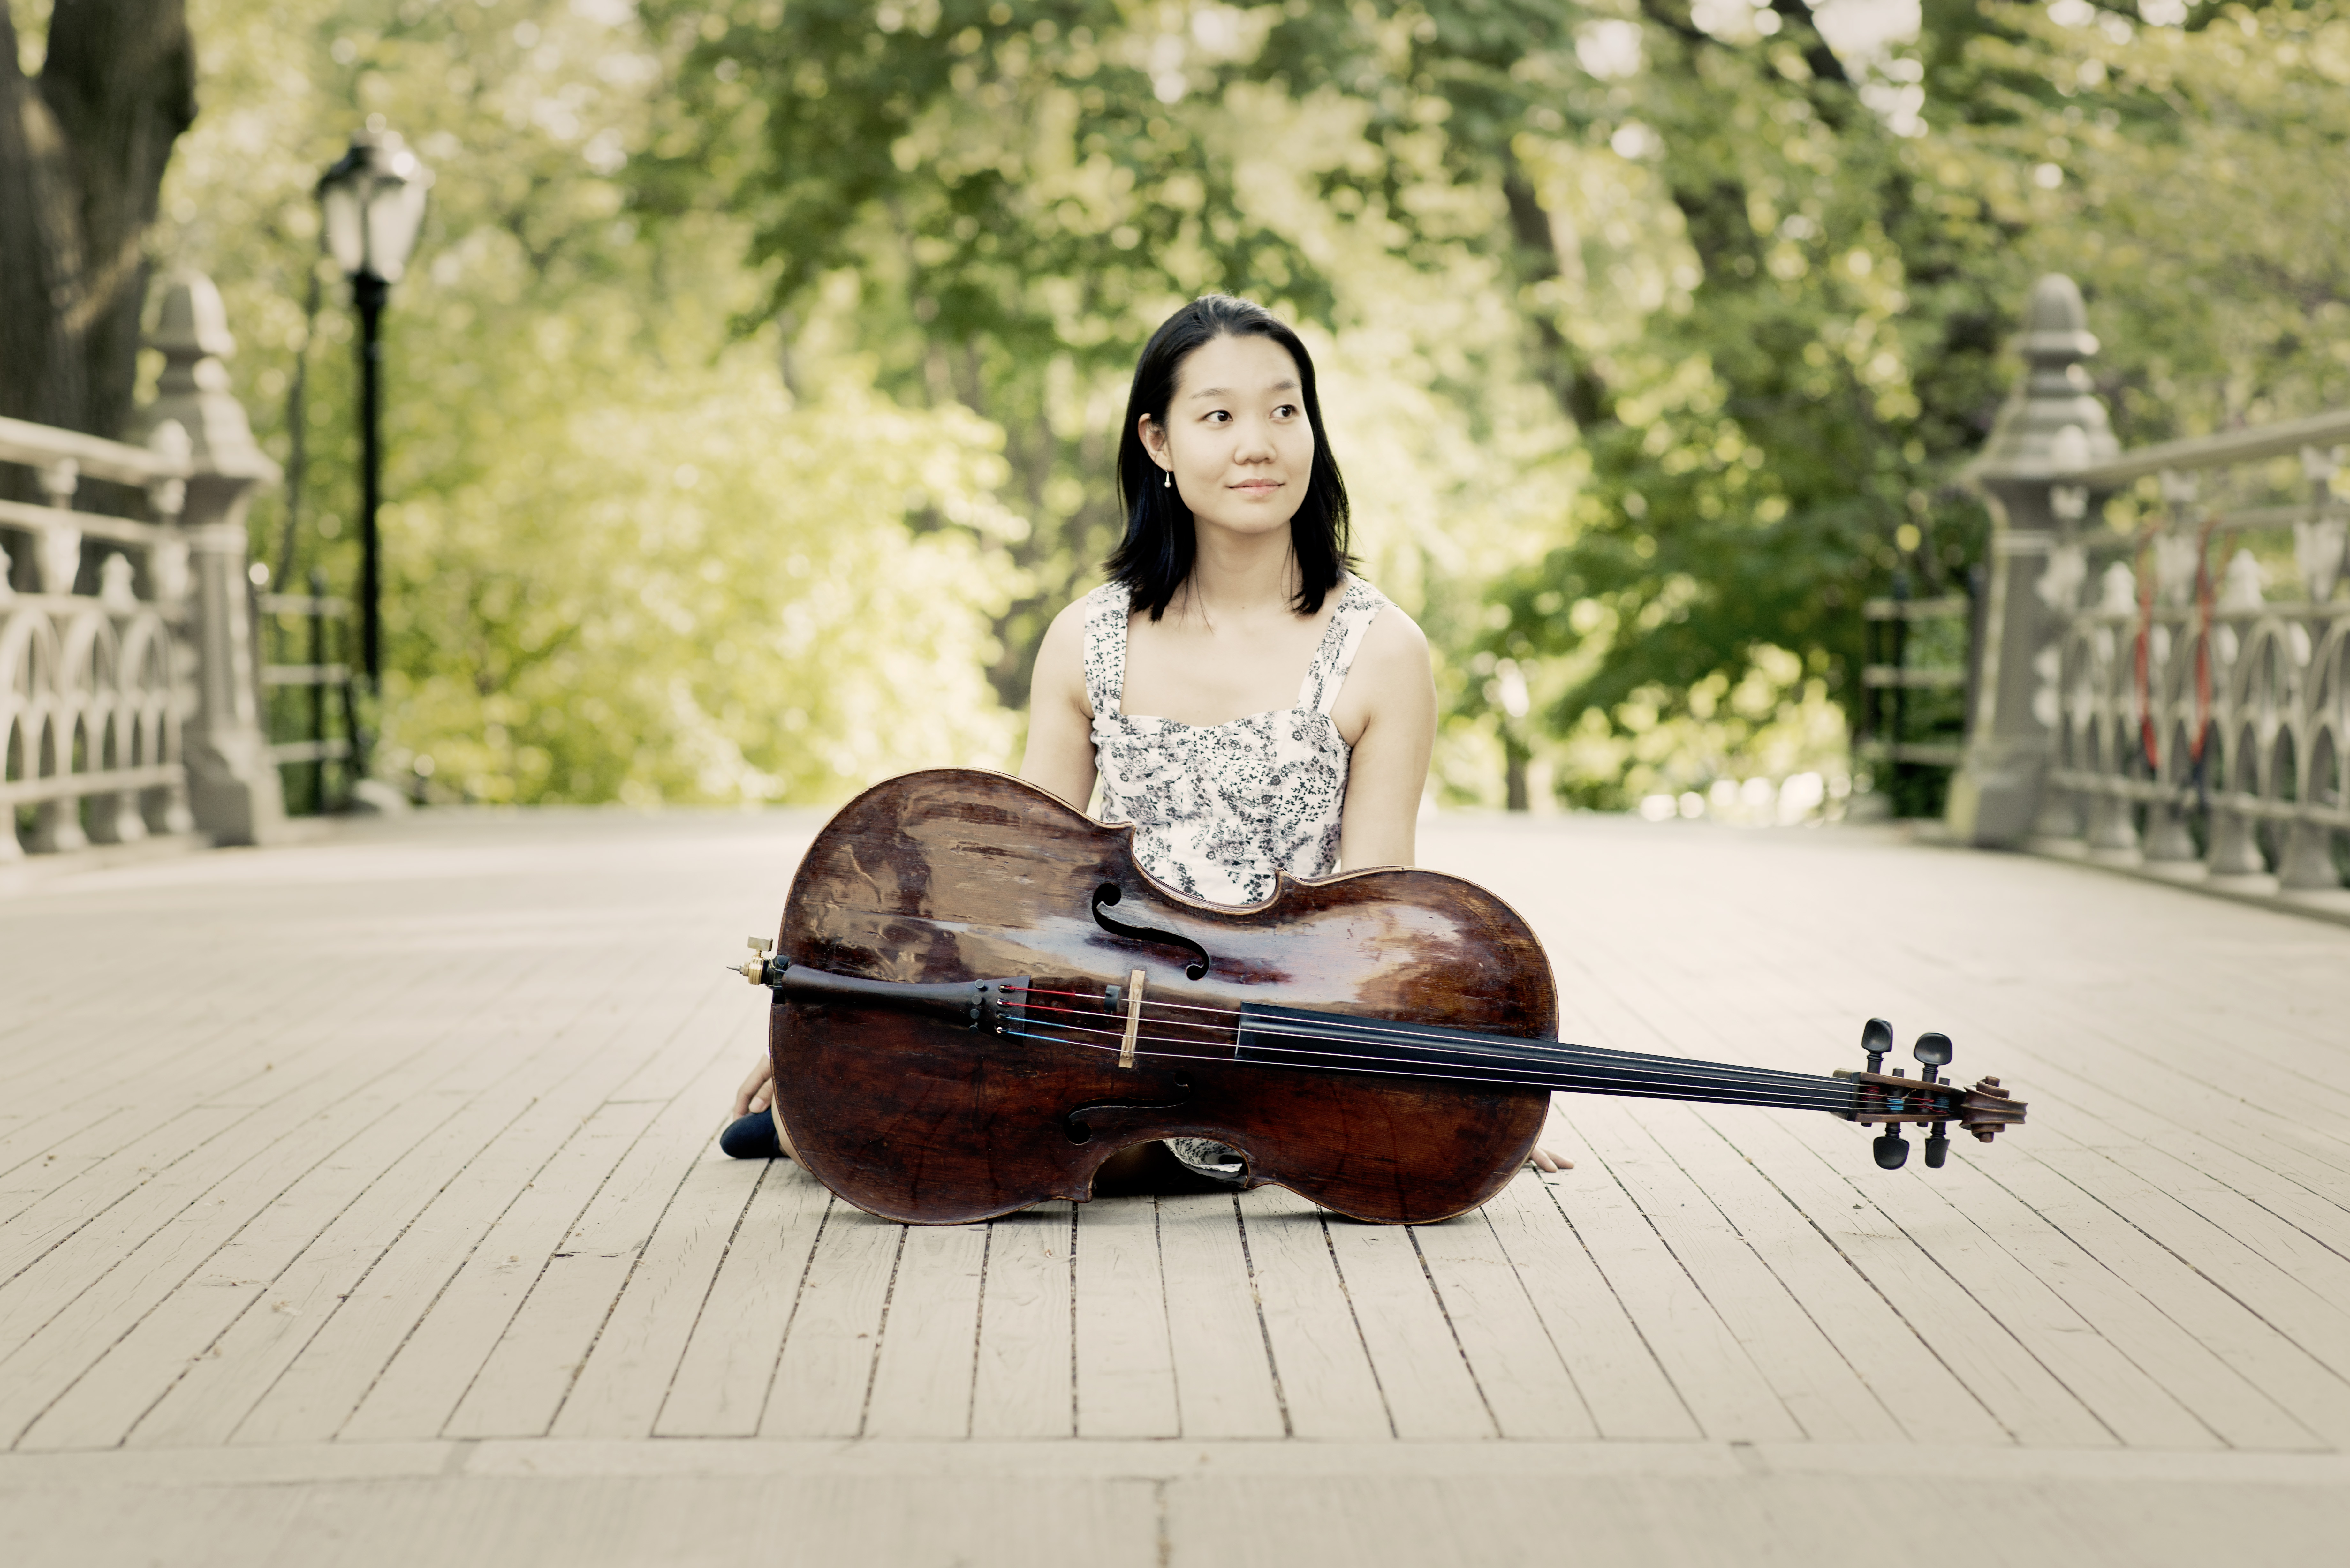 [Bard Conservatory Preparatory Division Faculty ConcertAlice Yoo, celloAdam Golka, piano]